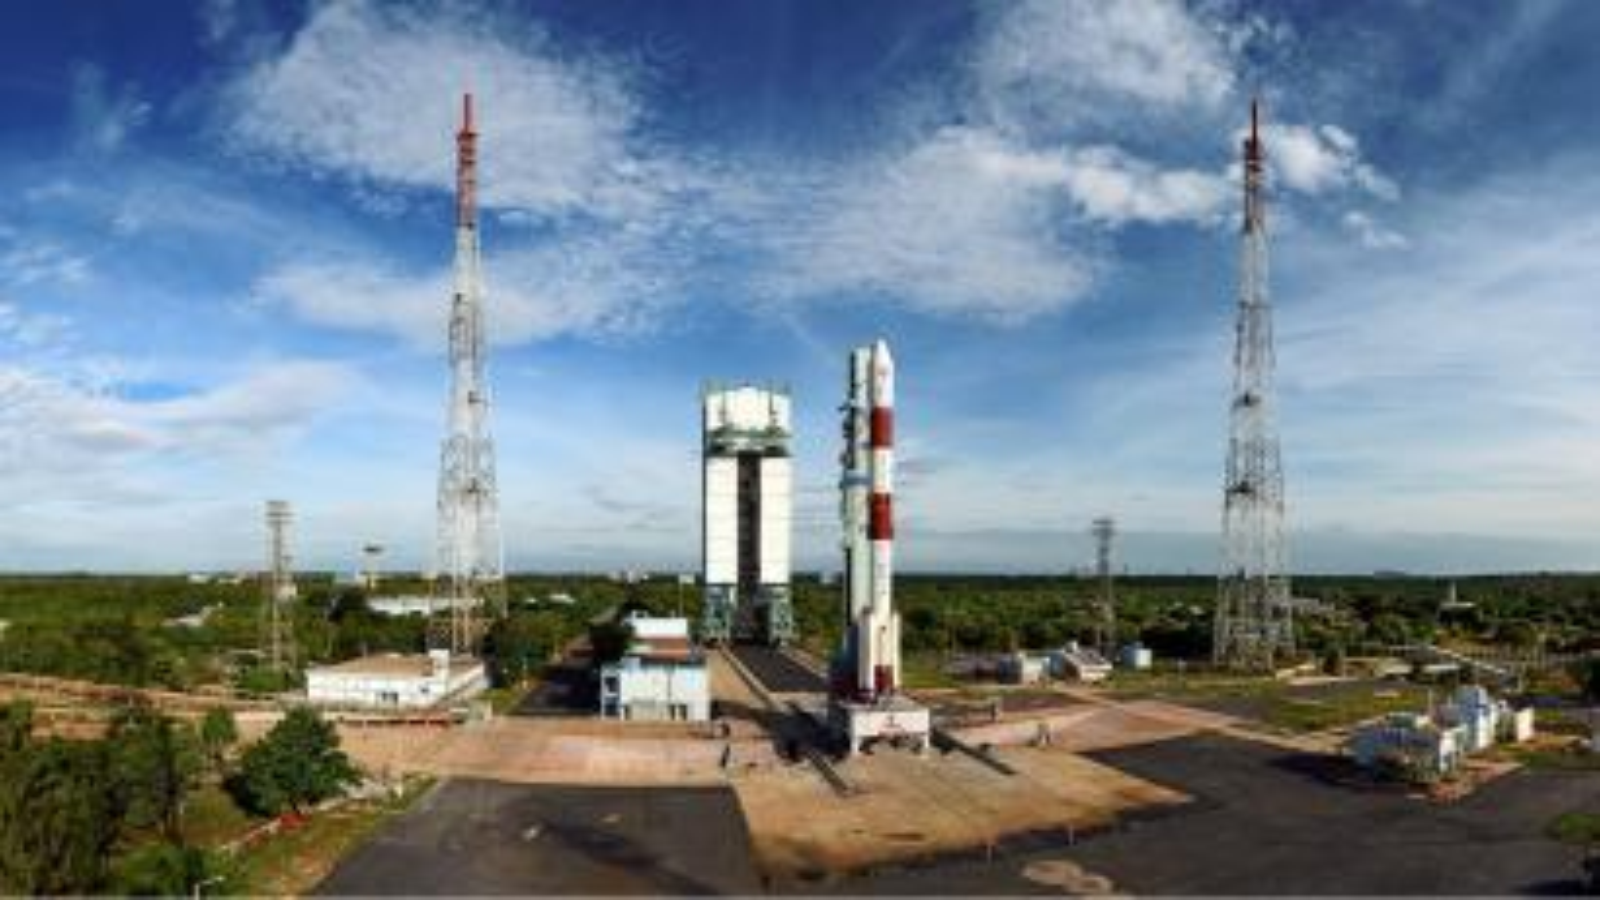 ISRO-Space-NASA-Satellite-PSLV-Rocket